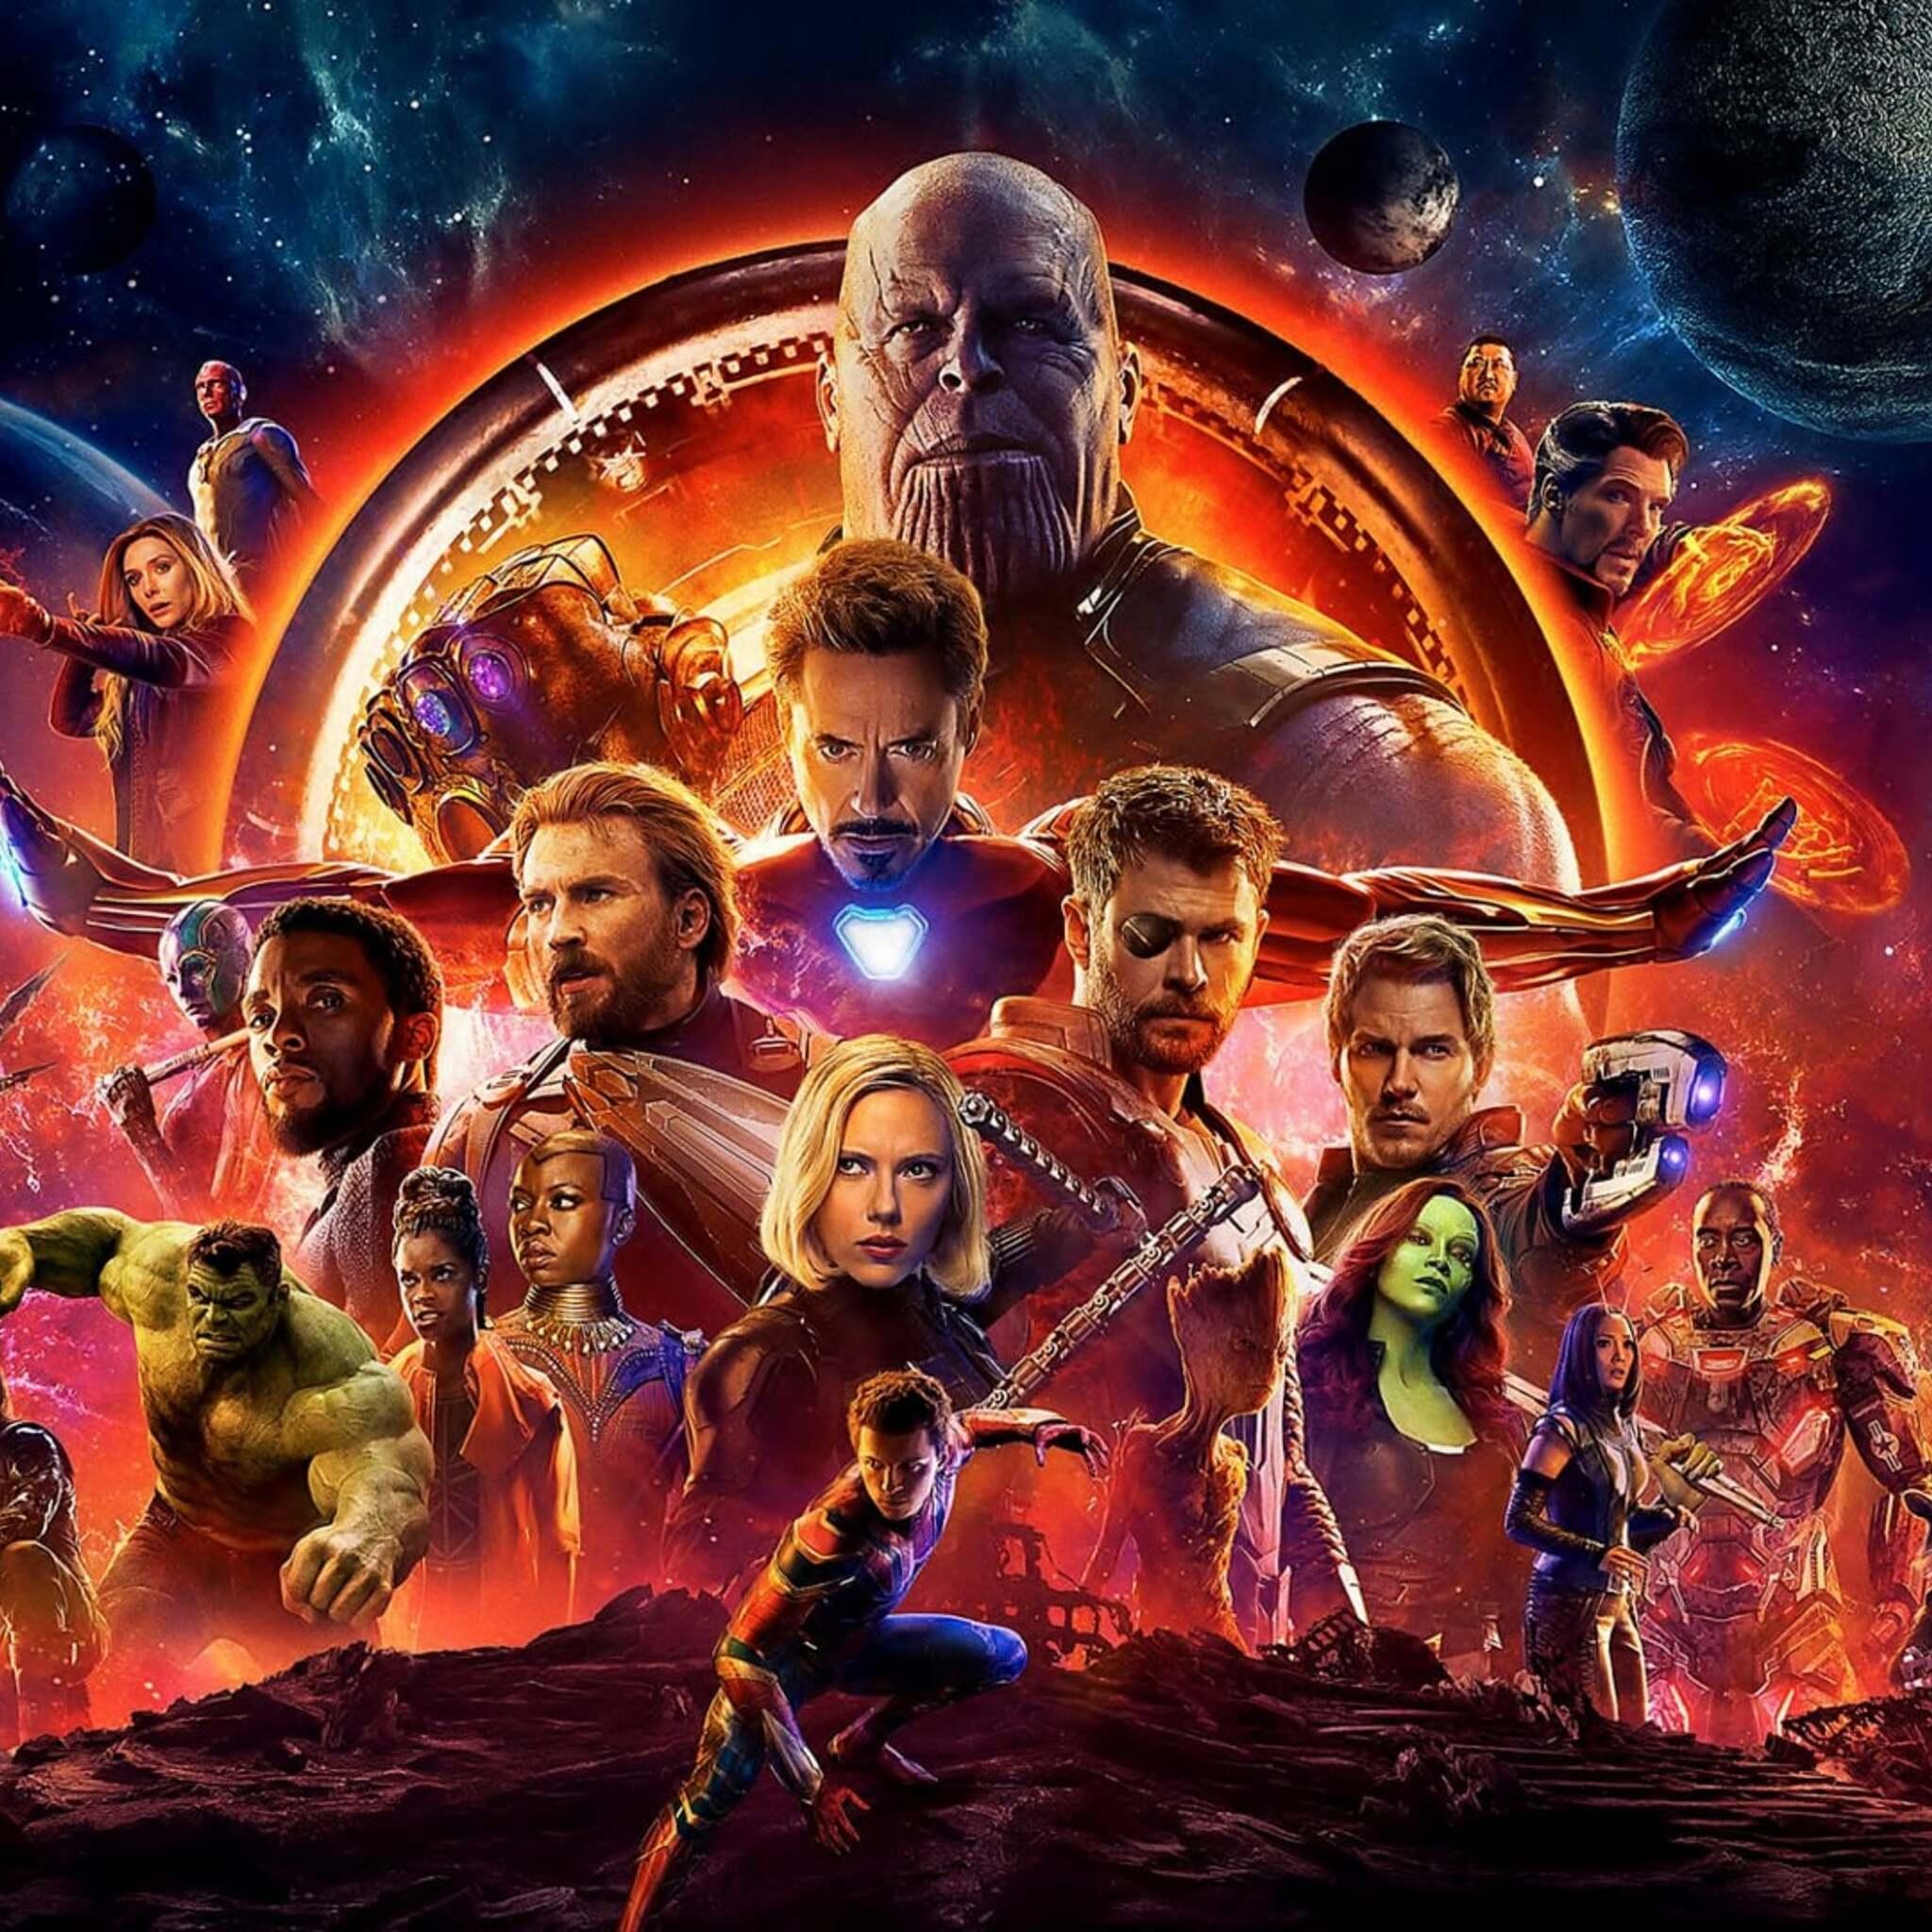 2048x2048 Avengers Infinity War Official Poster 2018 Ipad